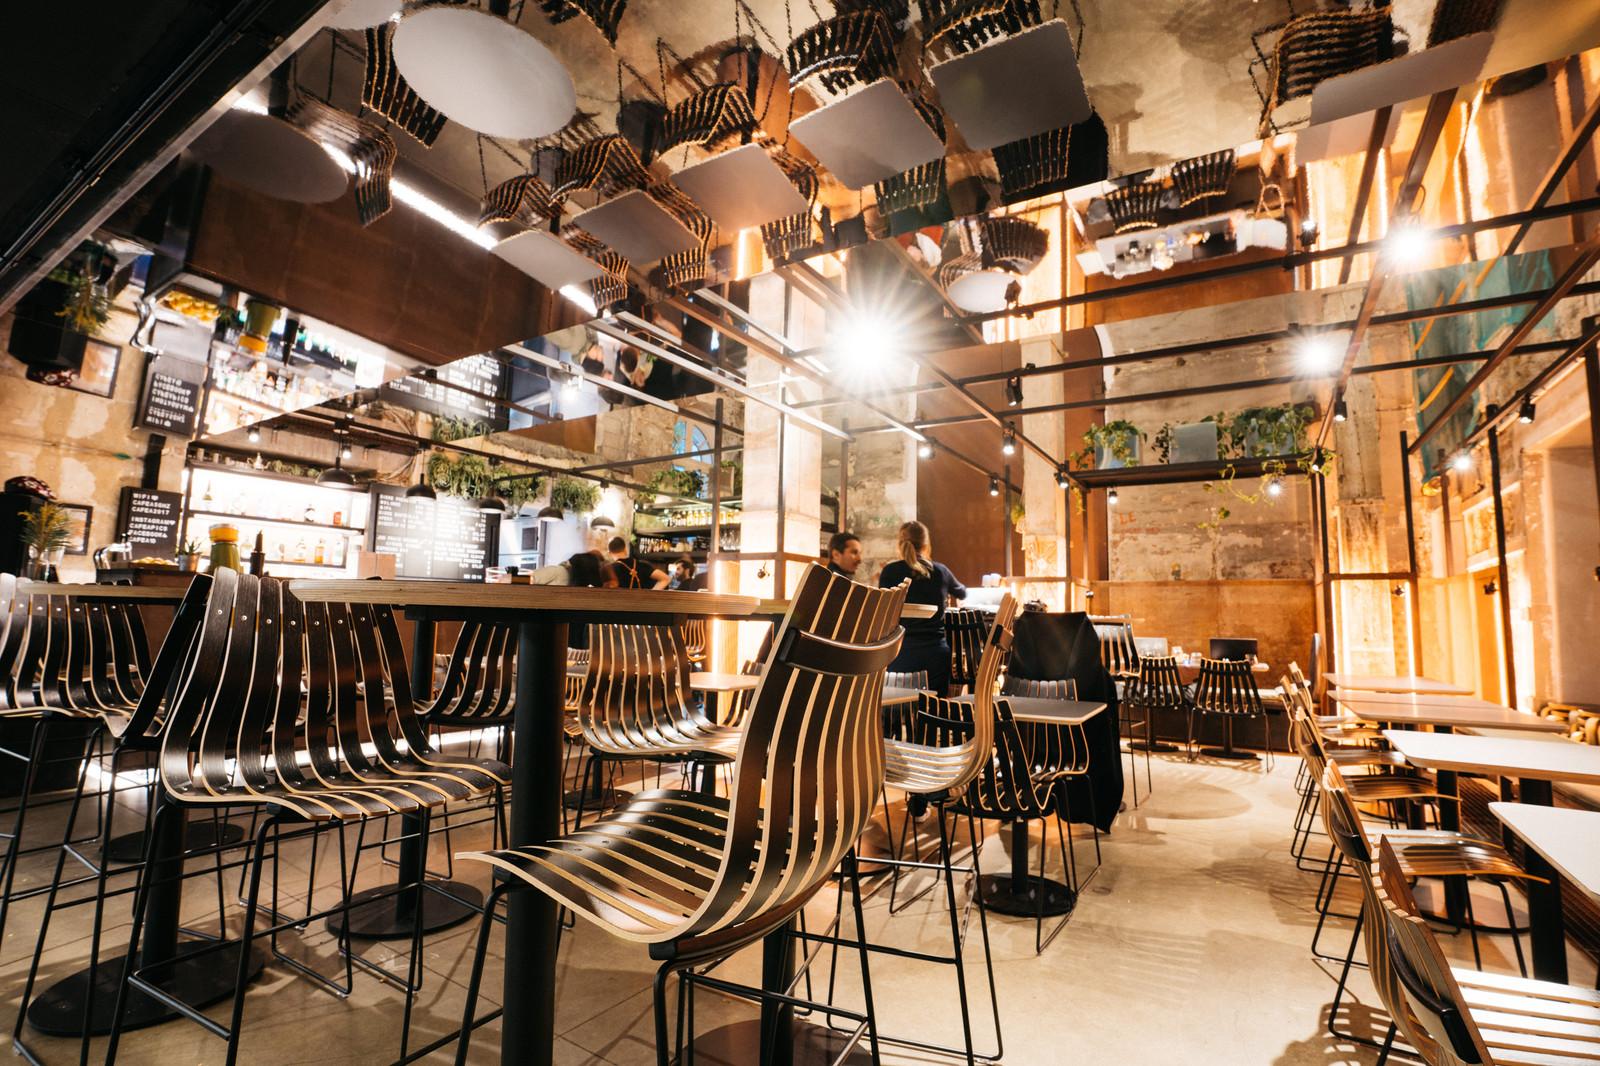 Café A | Restaurant Bar Terrasse Atypique   Paris 10 Canal St Martin